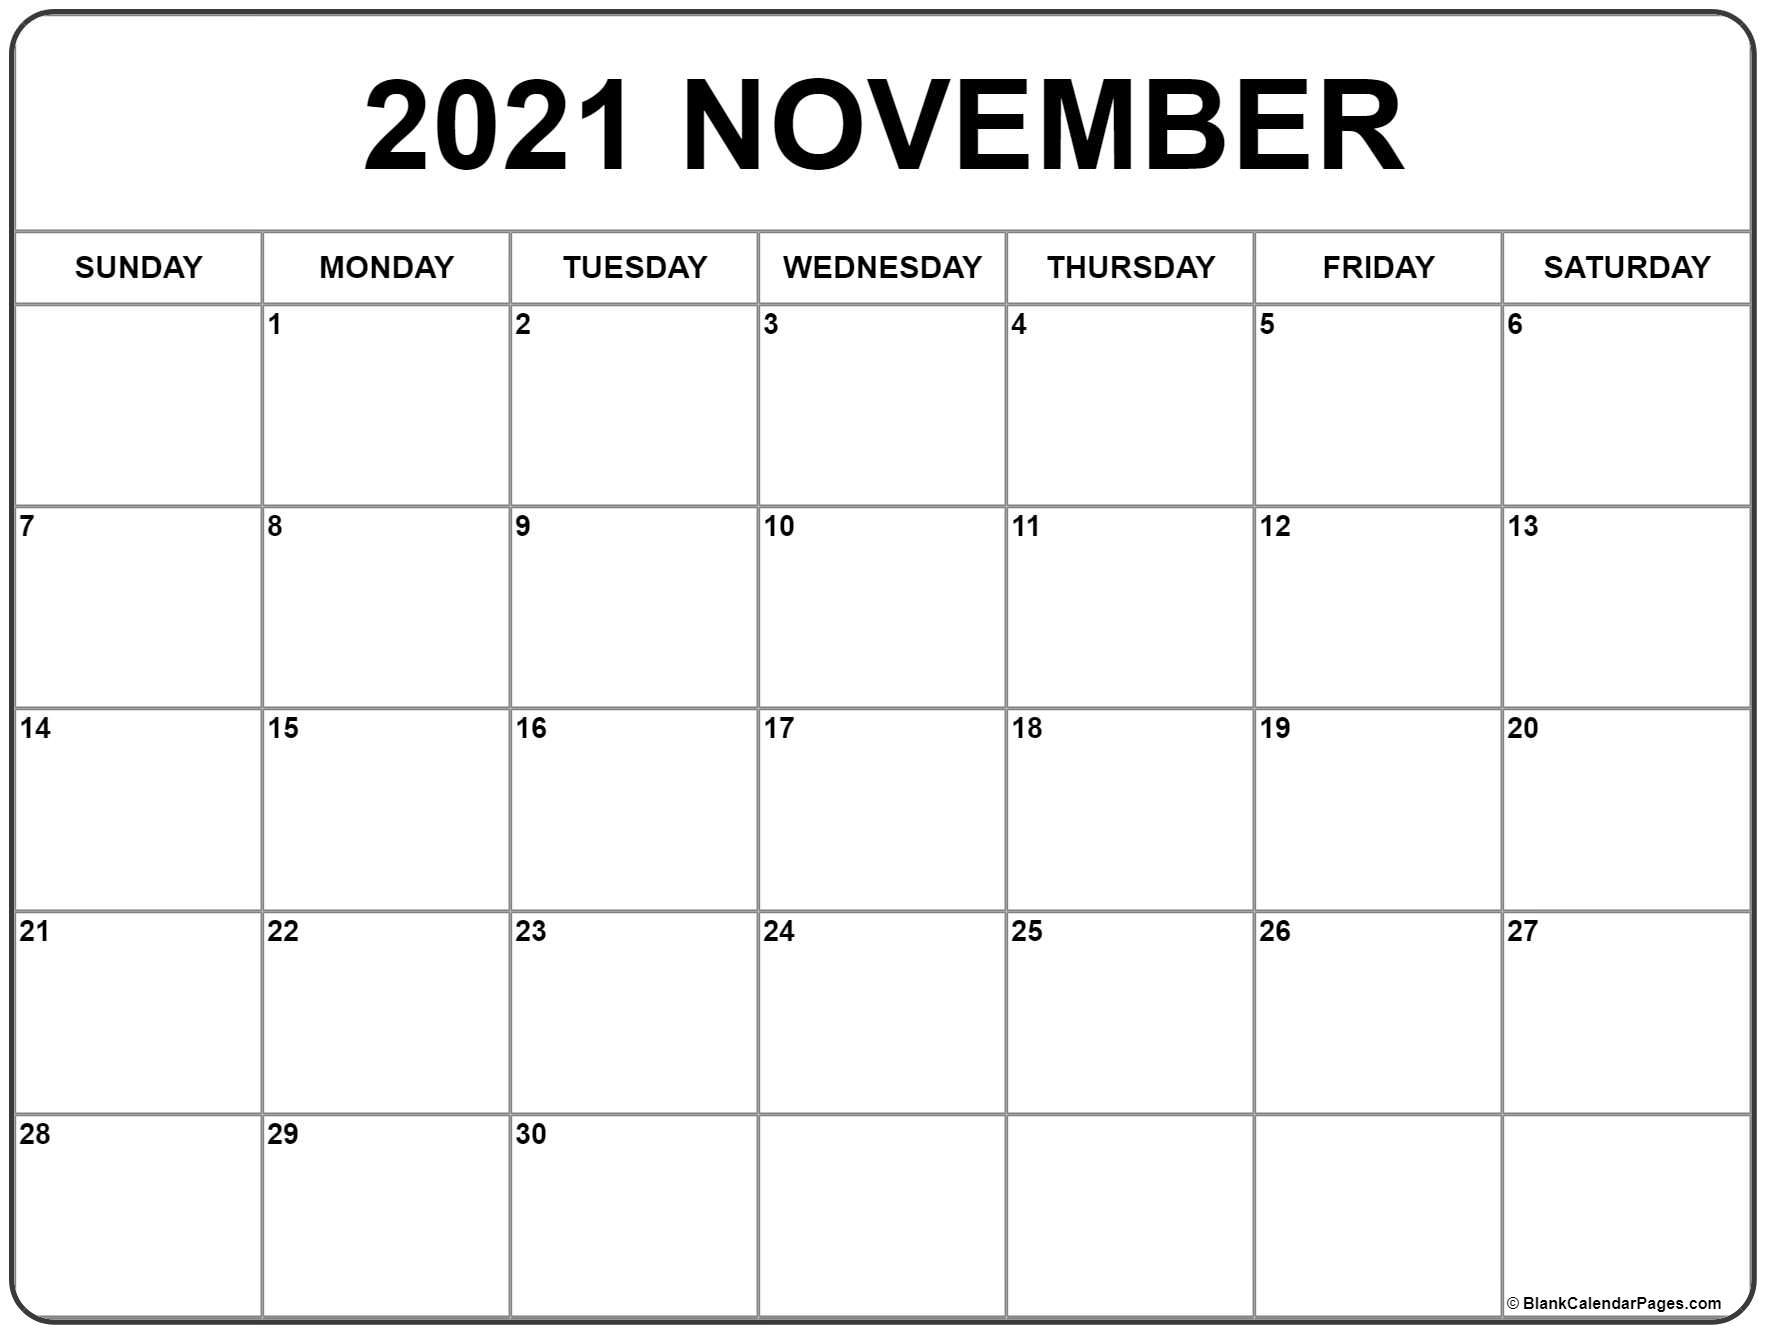 November 2021 Calendar | Free Printable Monthly Calendars throughout September 2021 Calendar Printable